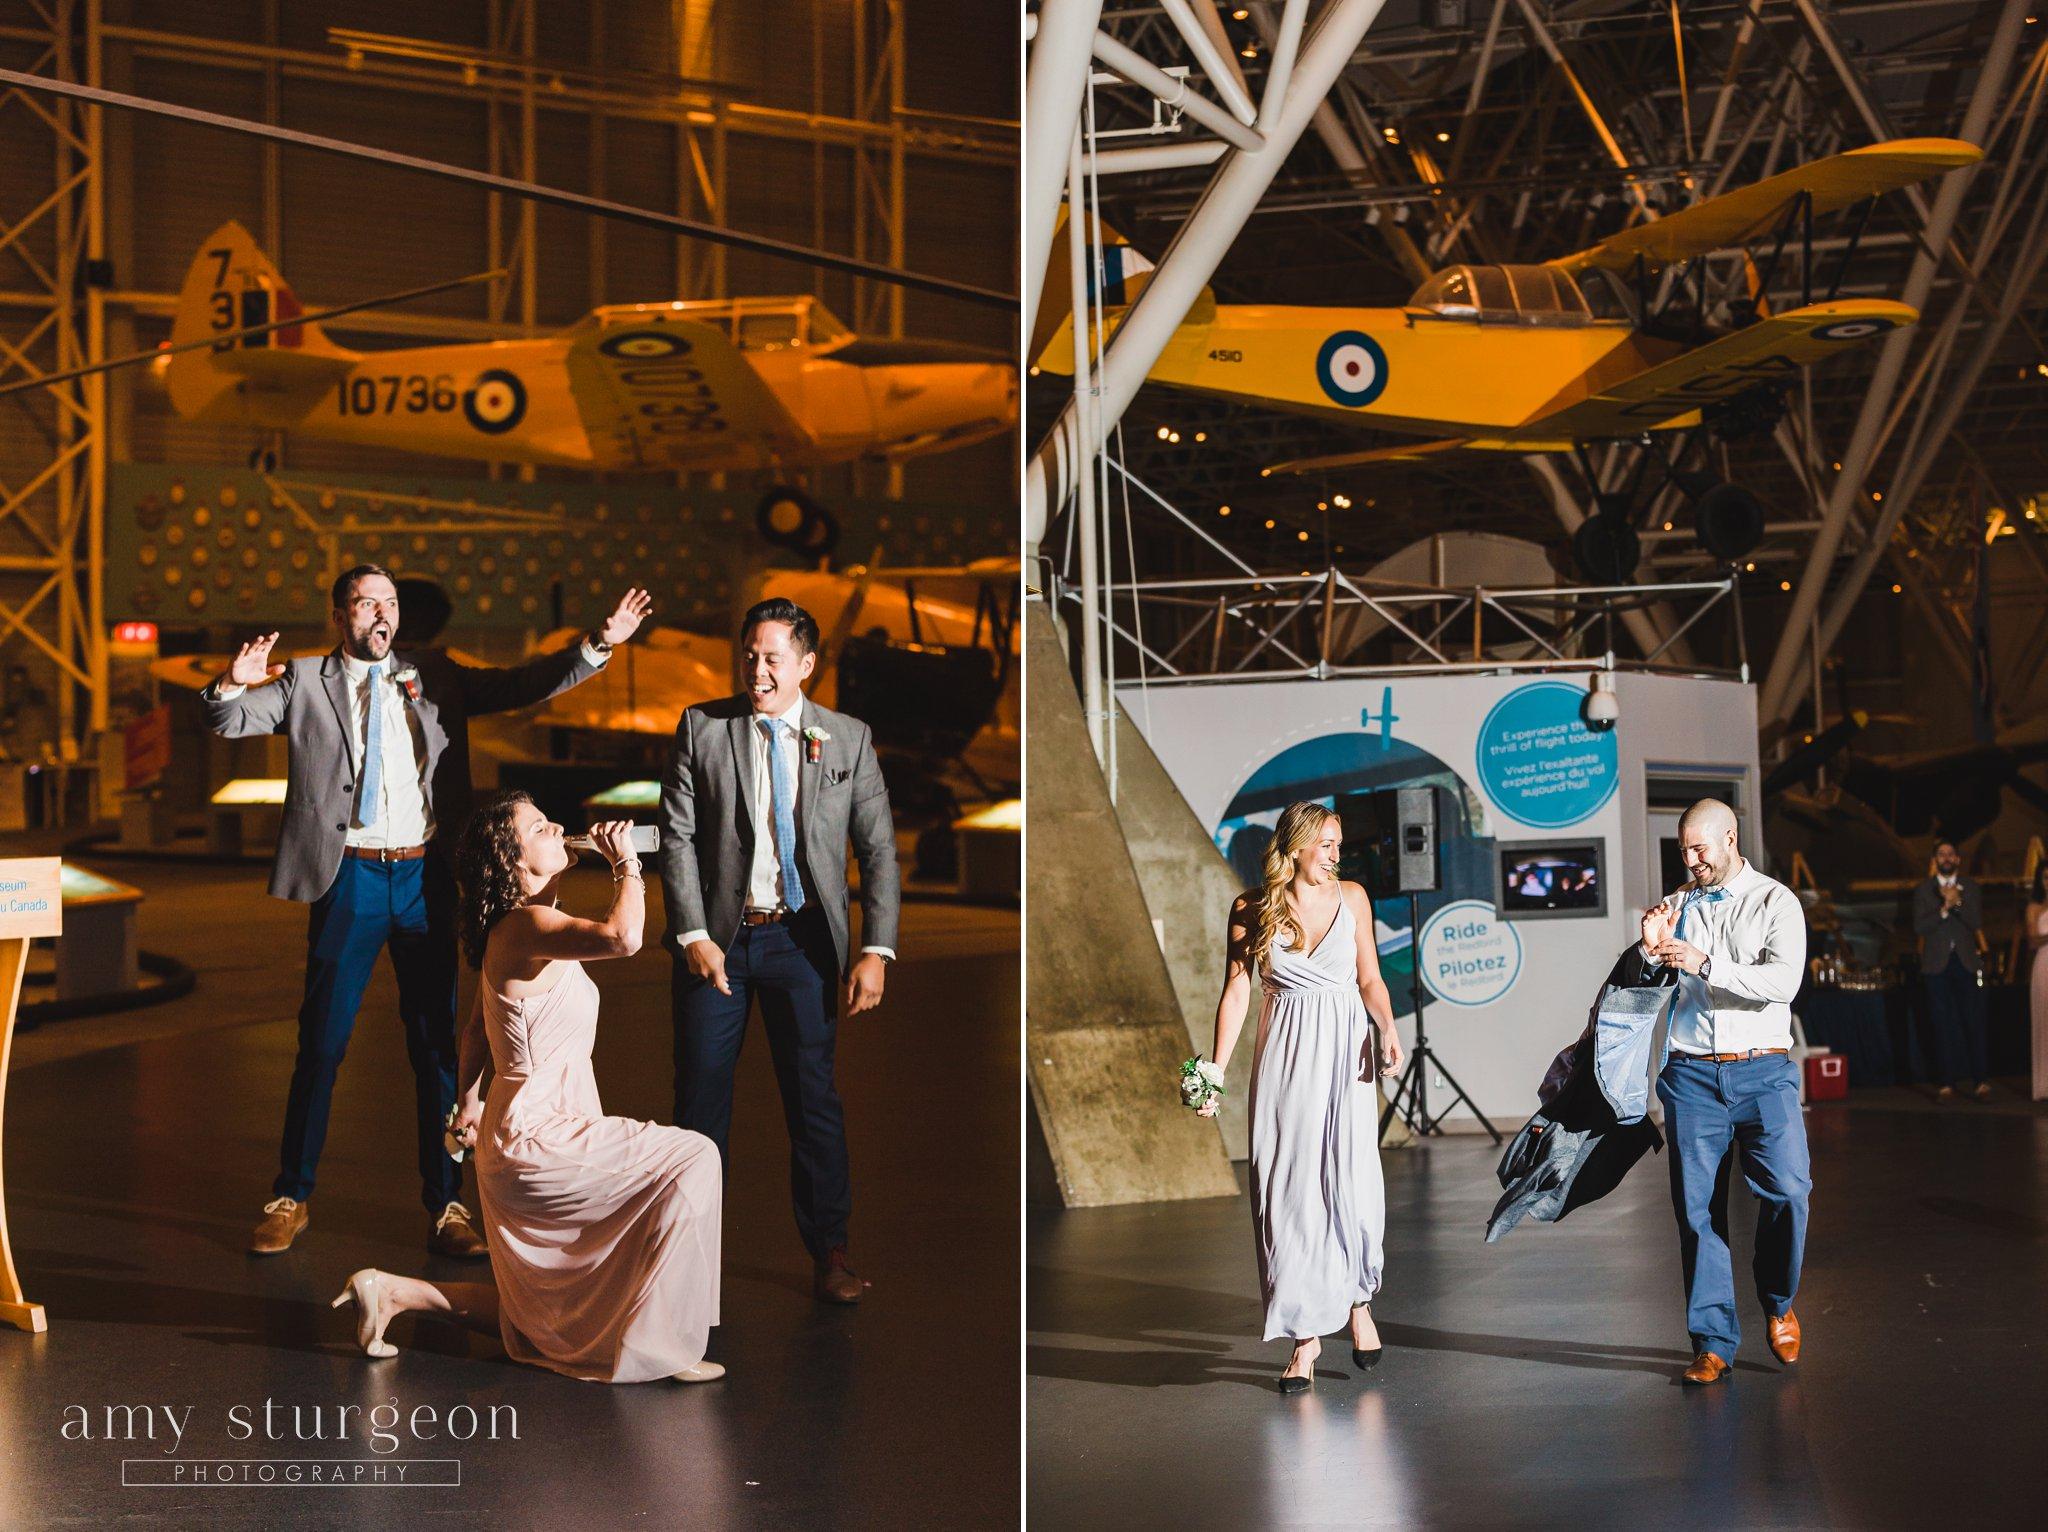 amy-sturgeon-photography_canadian-aviation-museum-wedding_0077